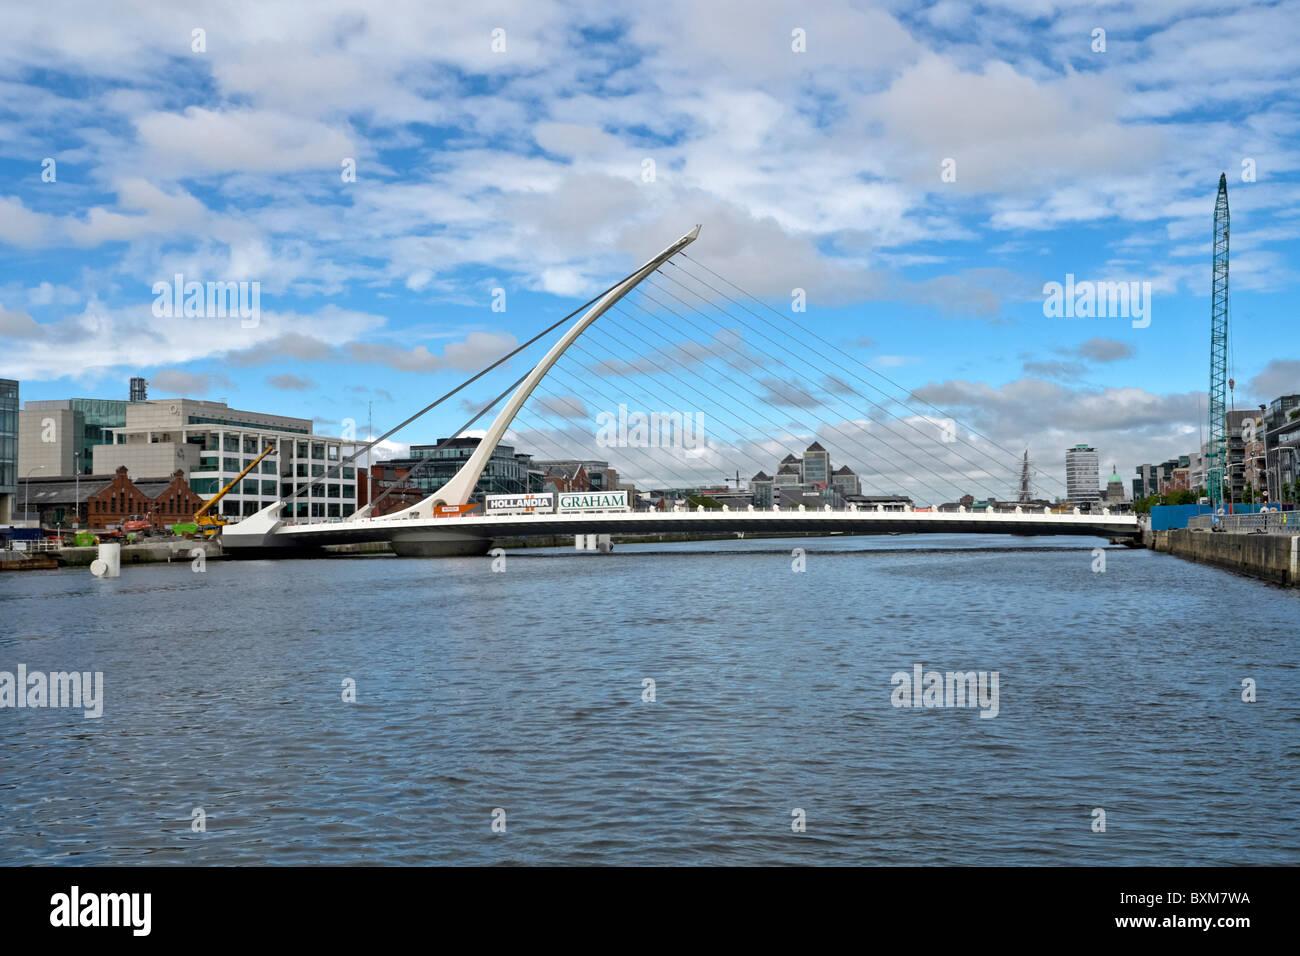 Samuel Beckett Bridge over River Liffey in Dublin Ireland Stock Photo